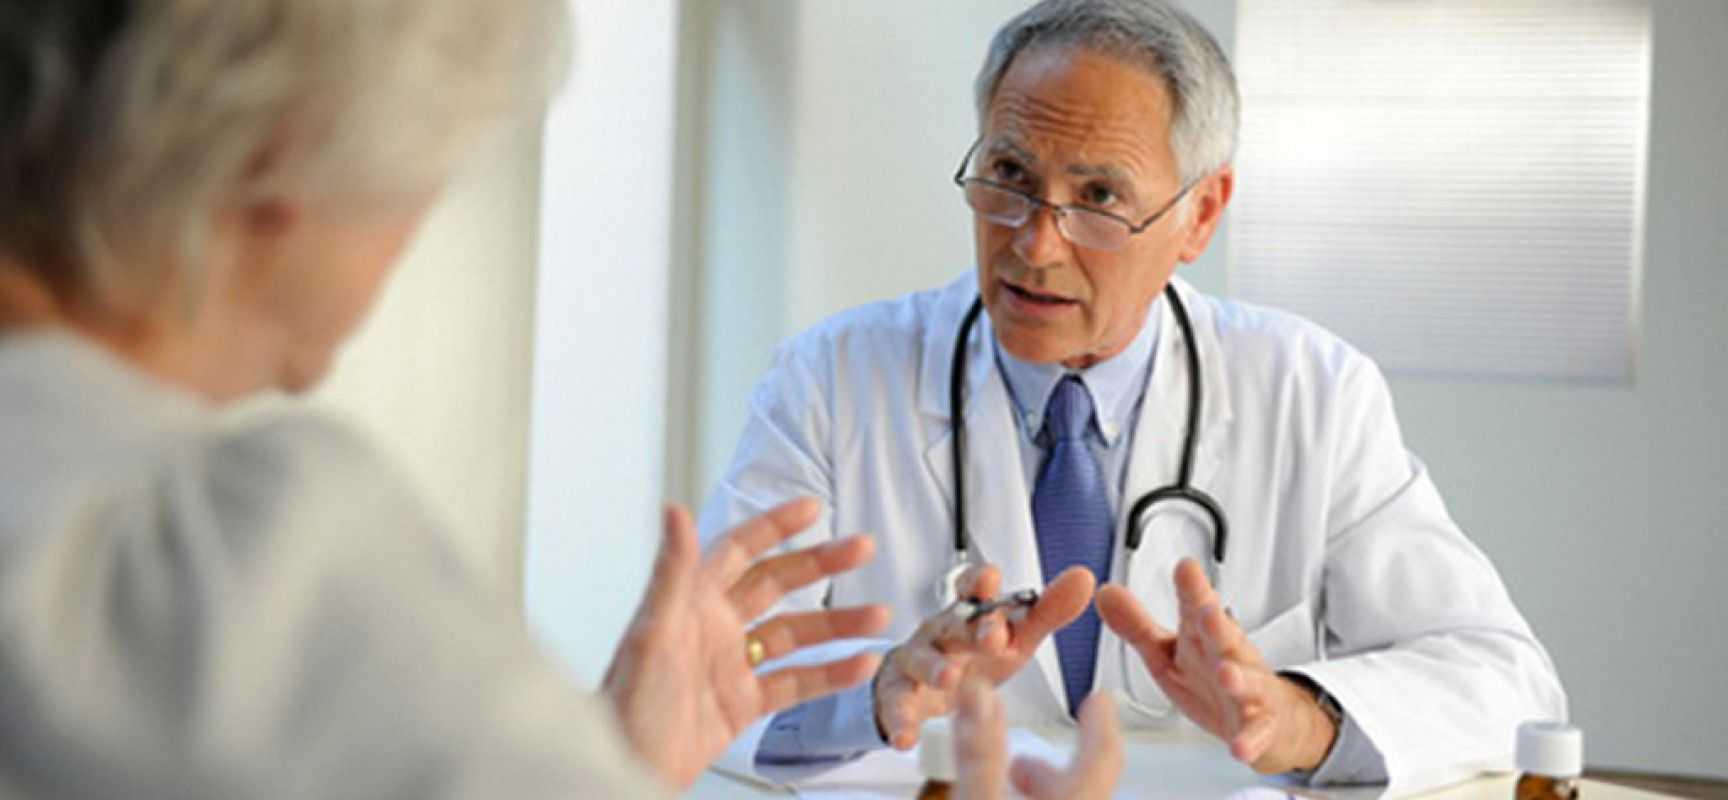 терапия у врача